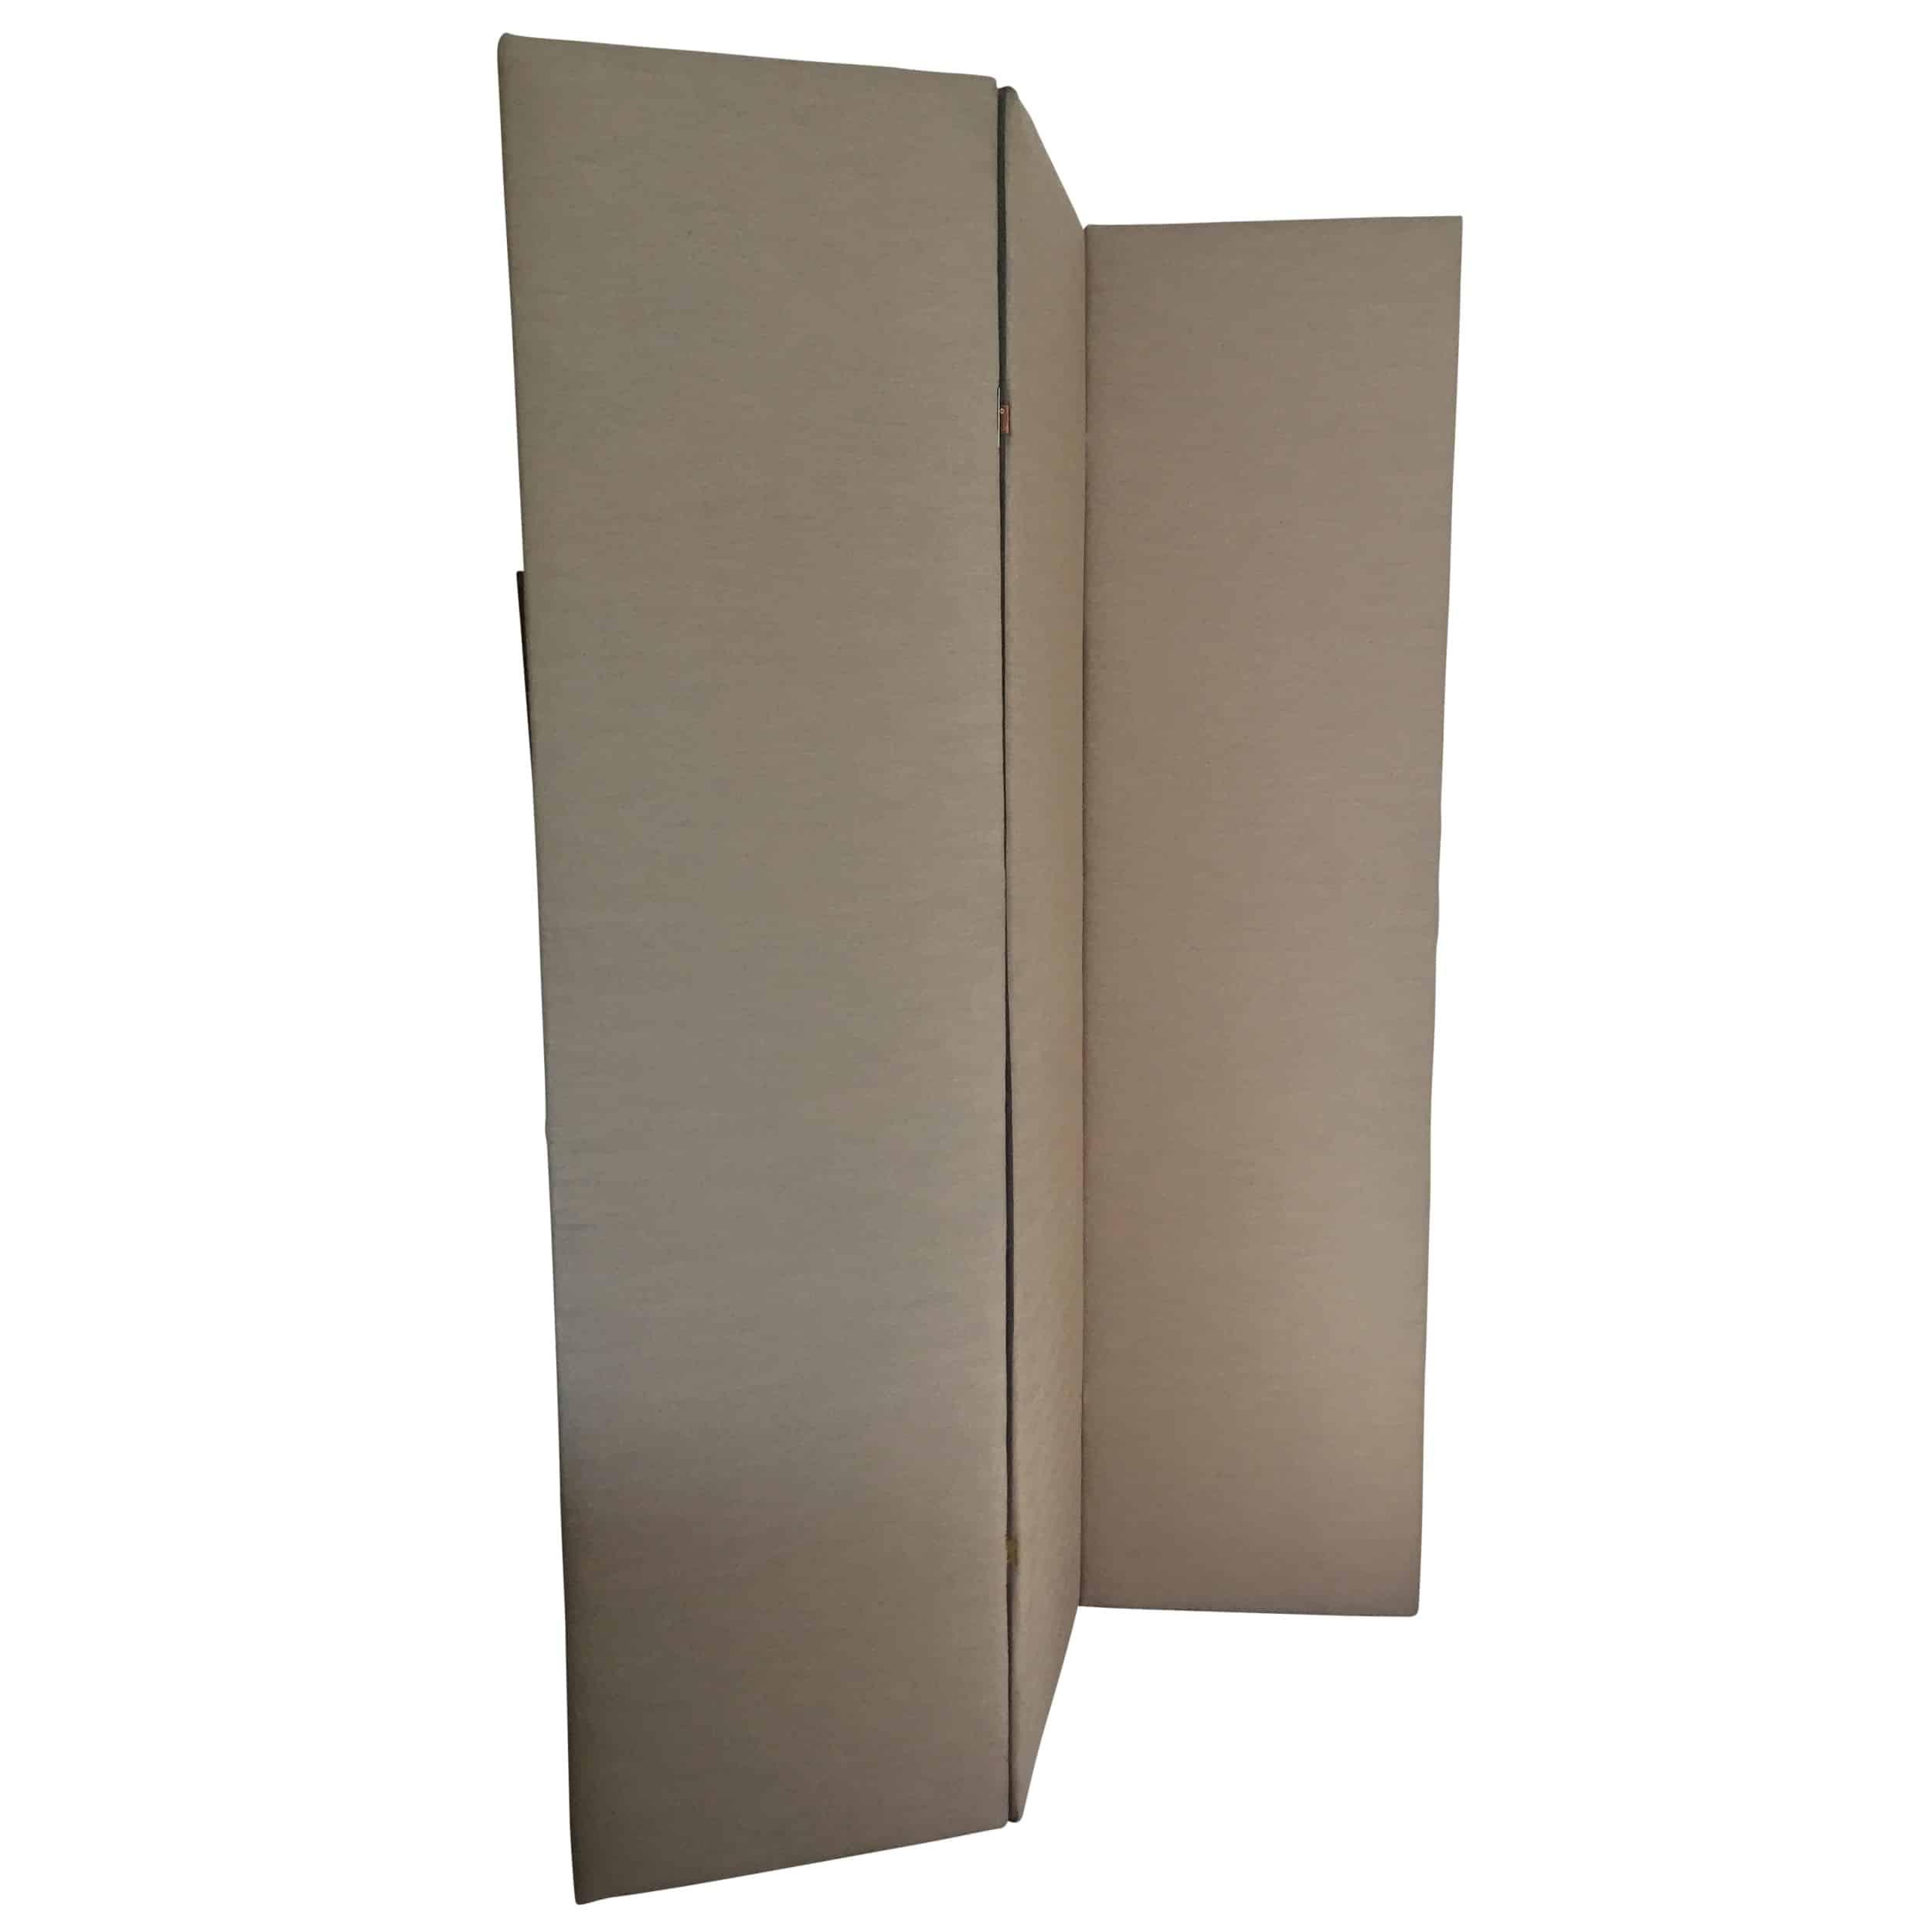 3 Paneled Upholstered Floor ScreenRoom Divider Cabana Home